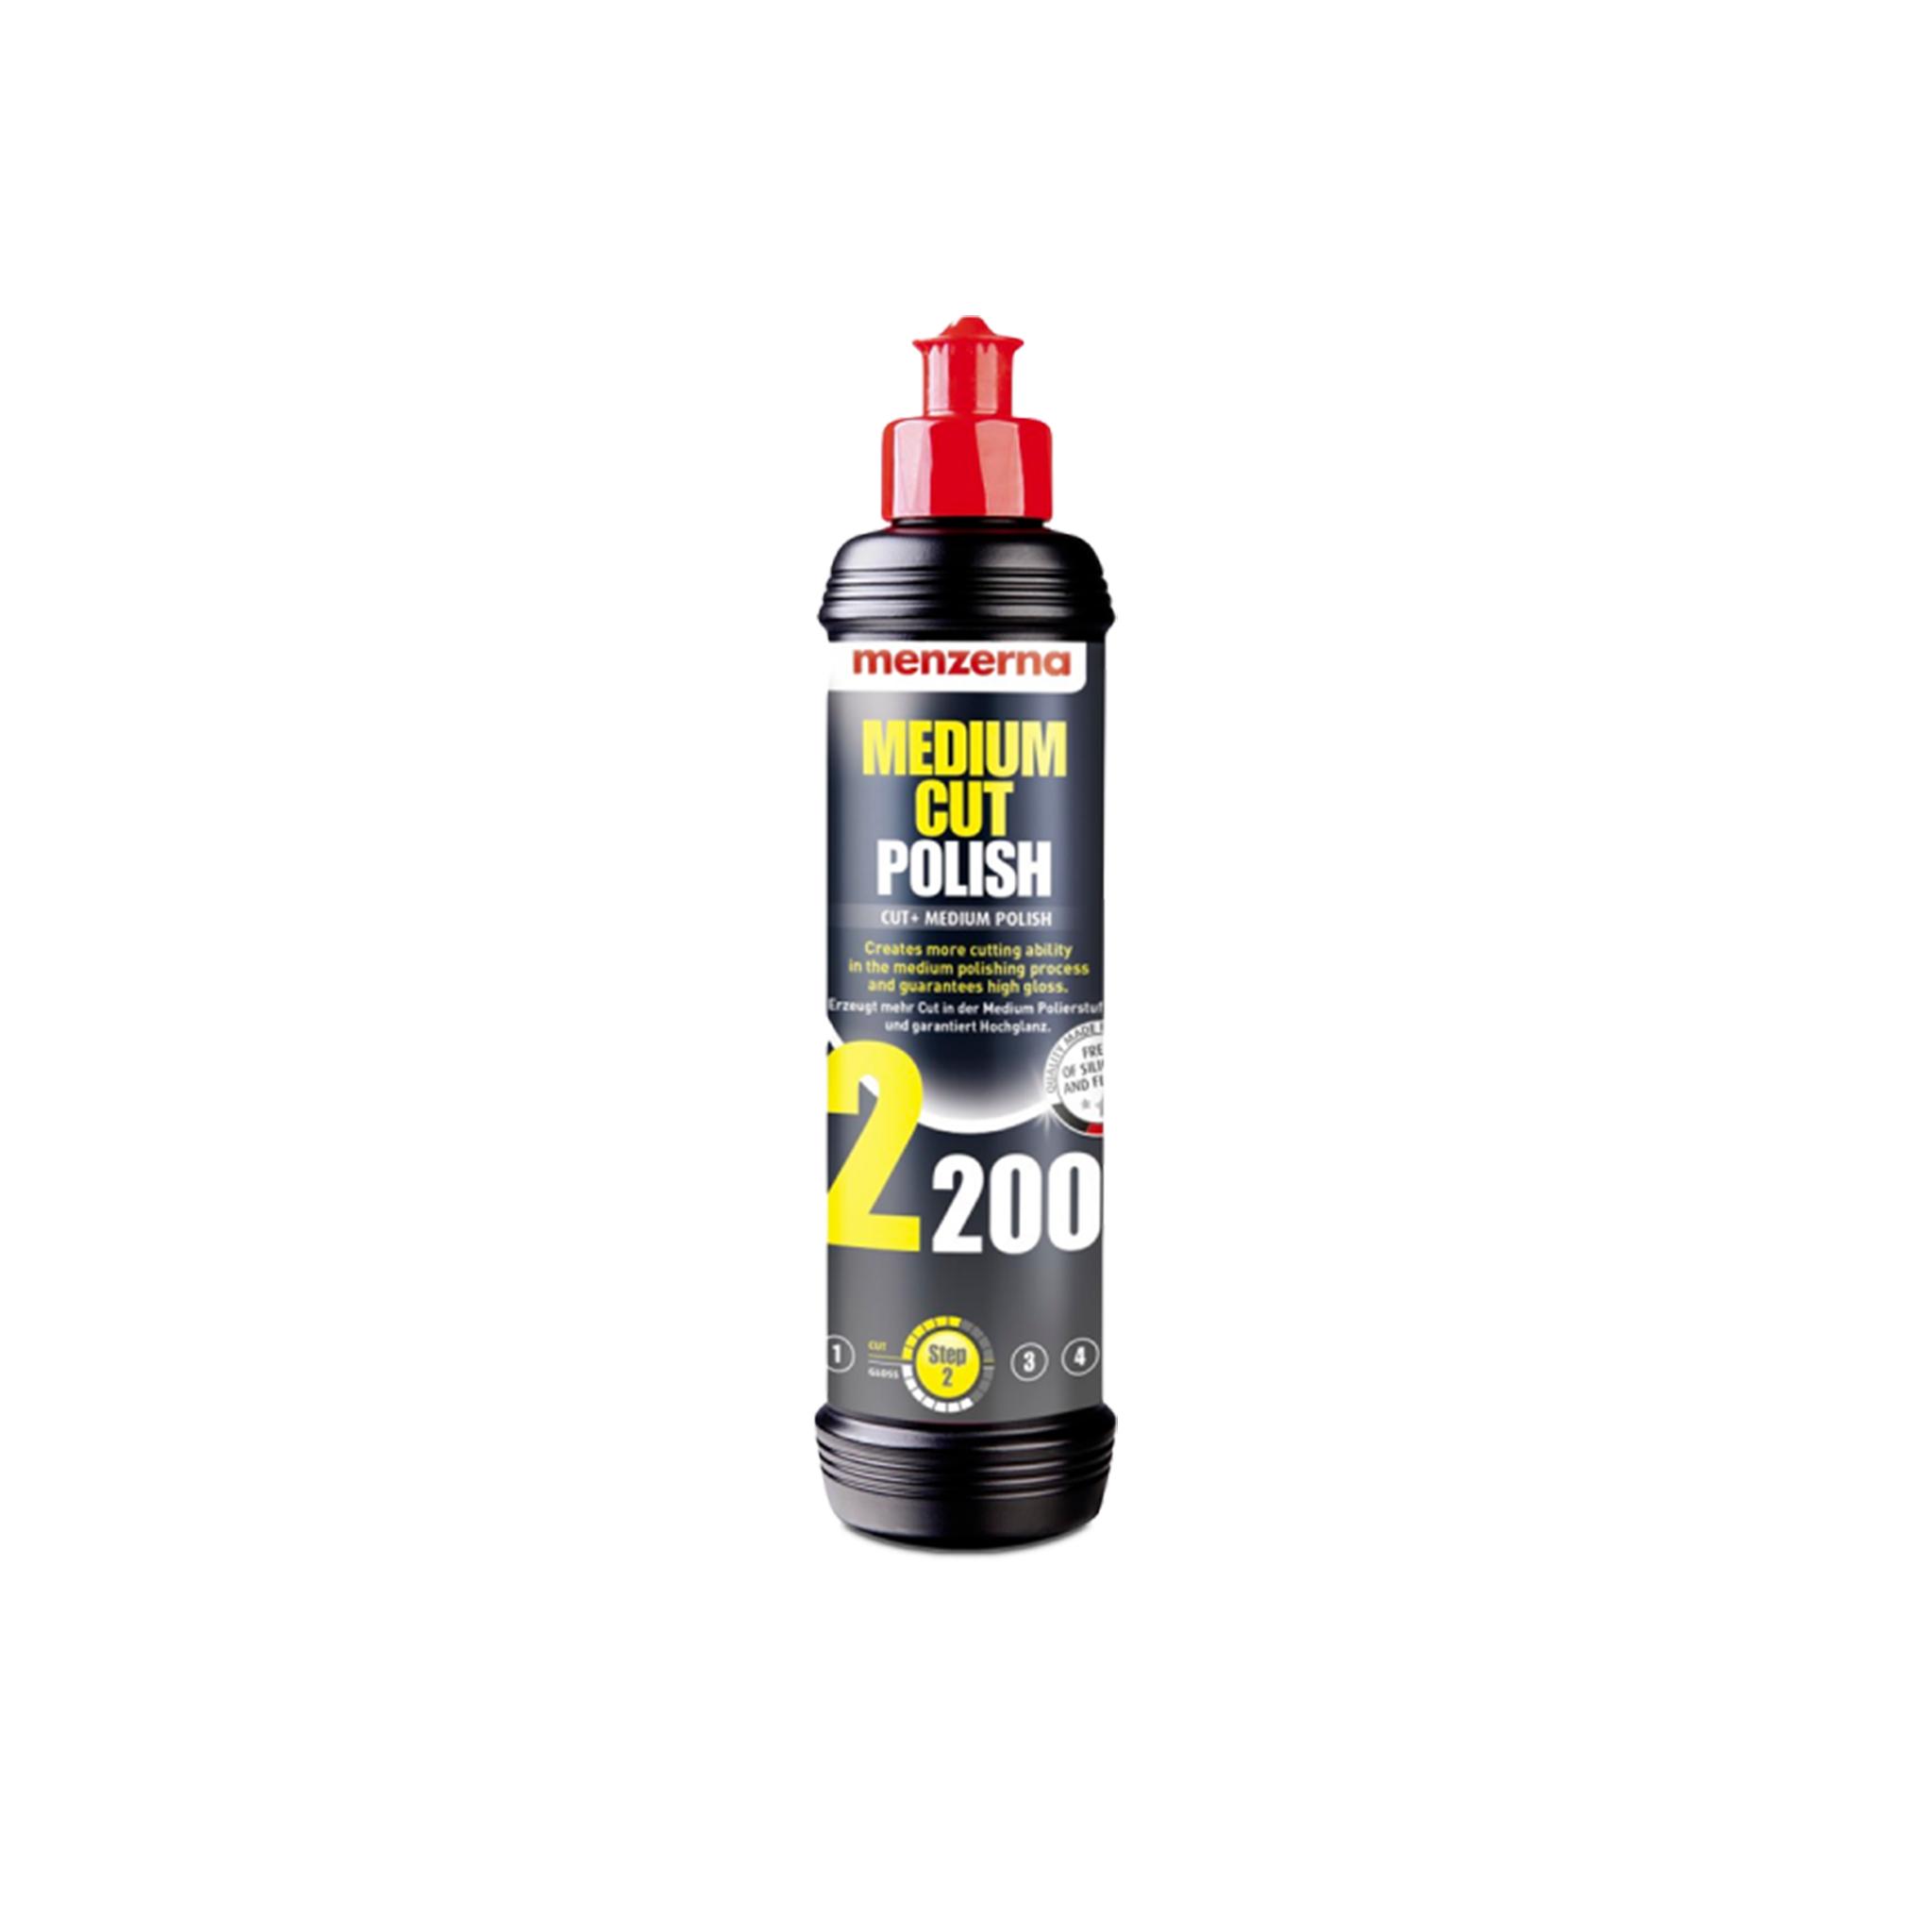 Polermedel Menzerna Medium Cut 2200- Rubbing/Polishing, 1000 ml